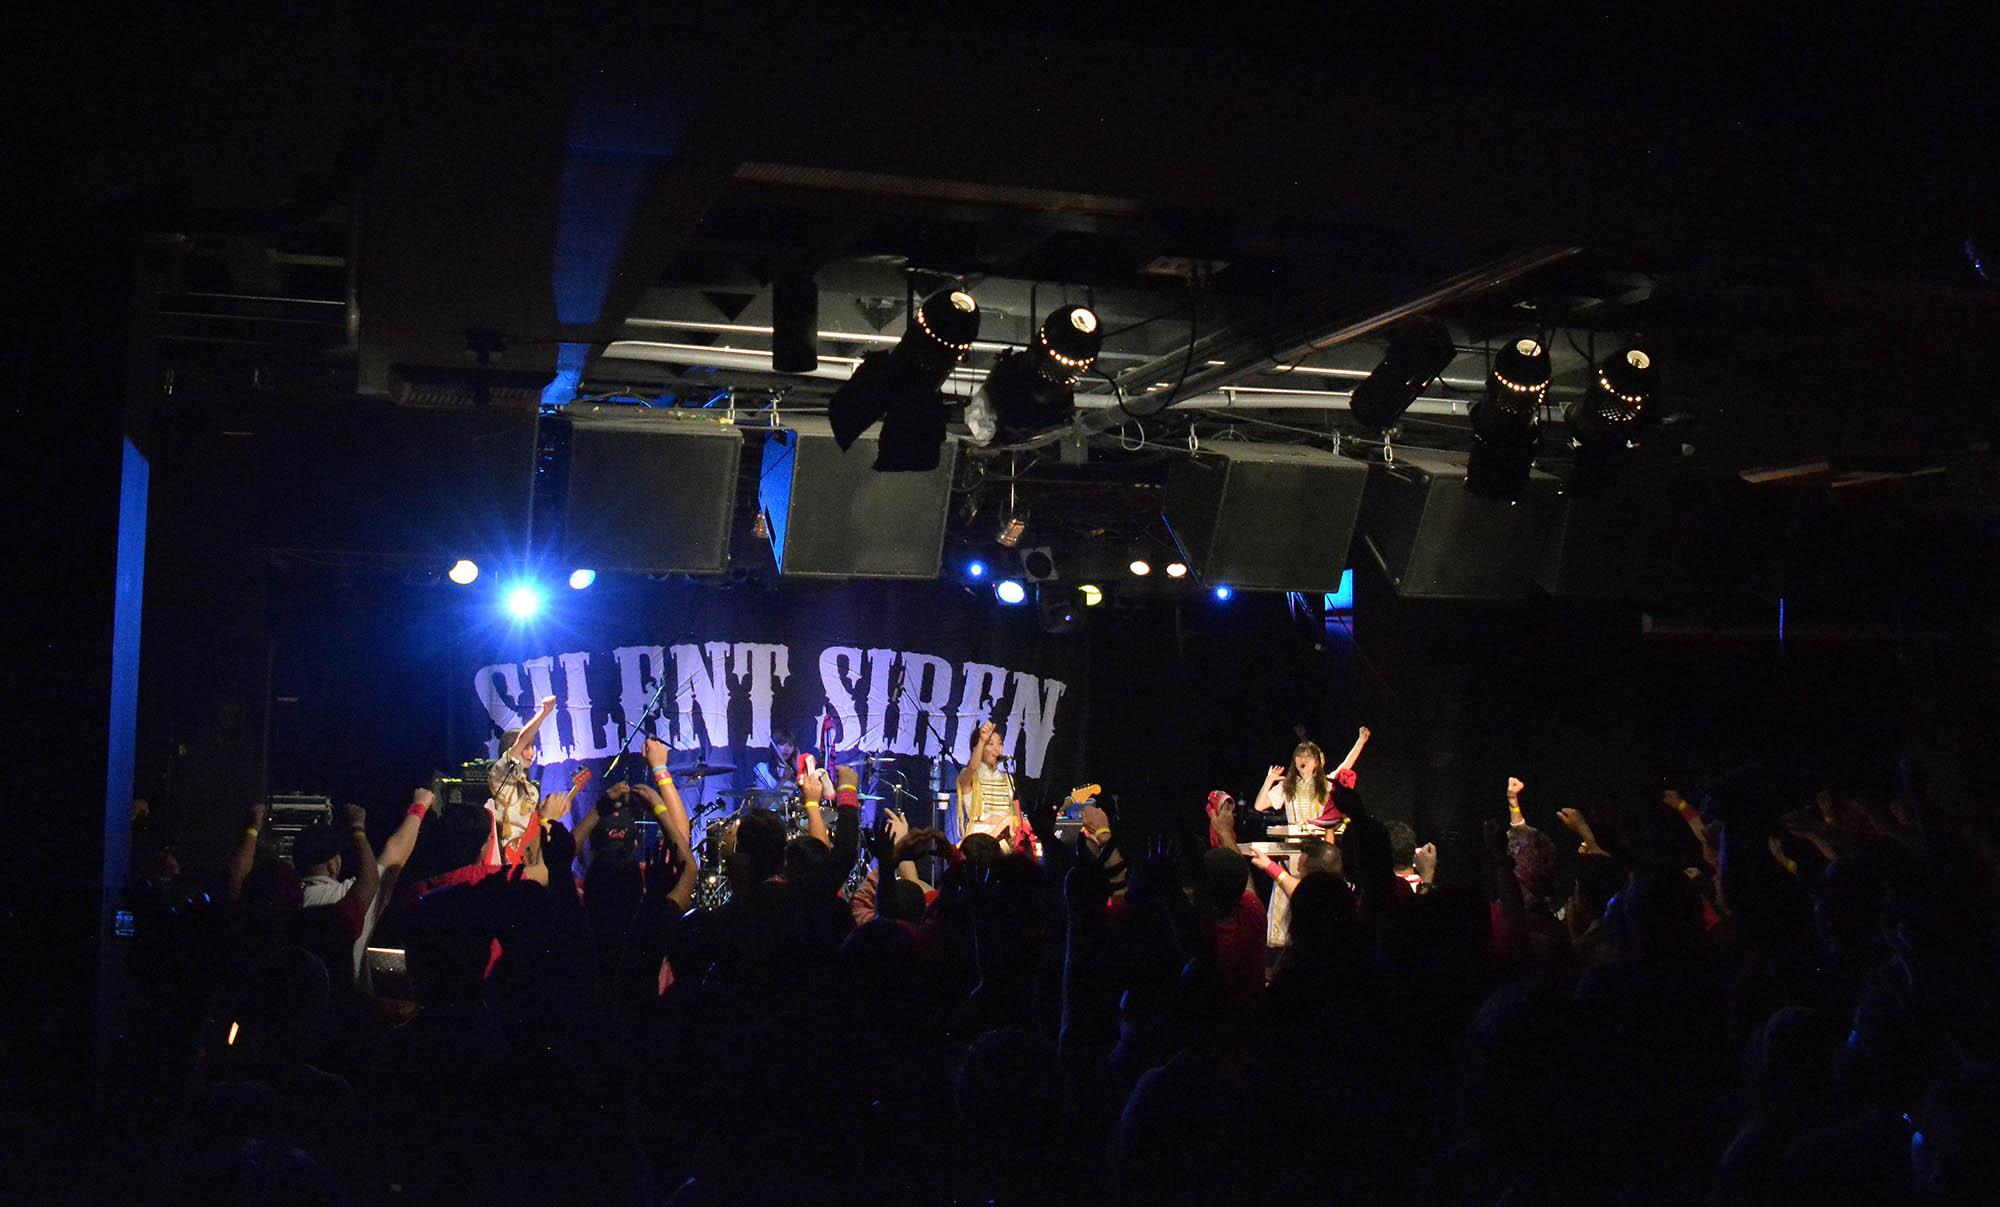 JRock247-SILENT-SIREN-2017-LA-Saisai-01